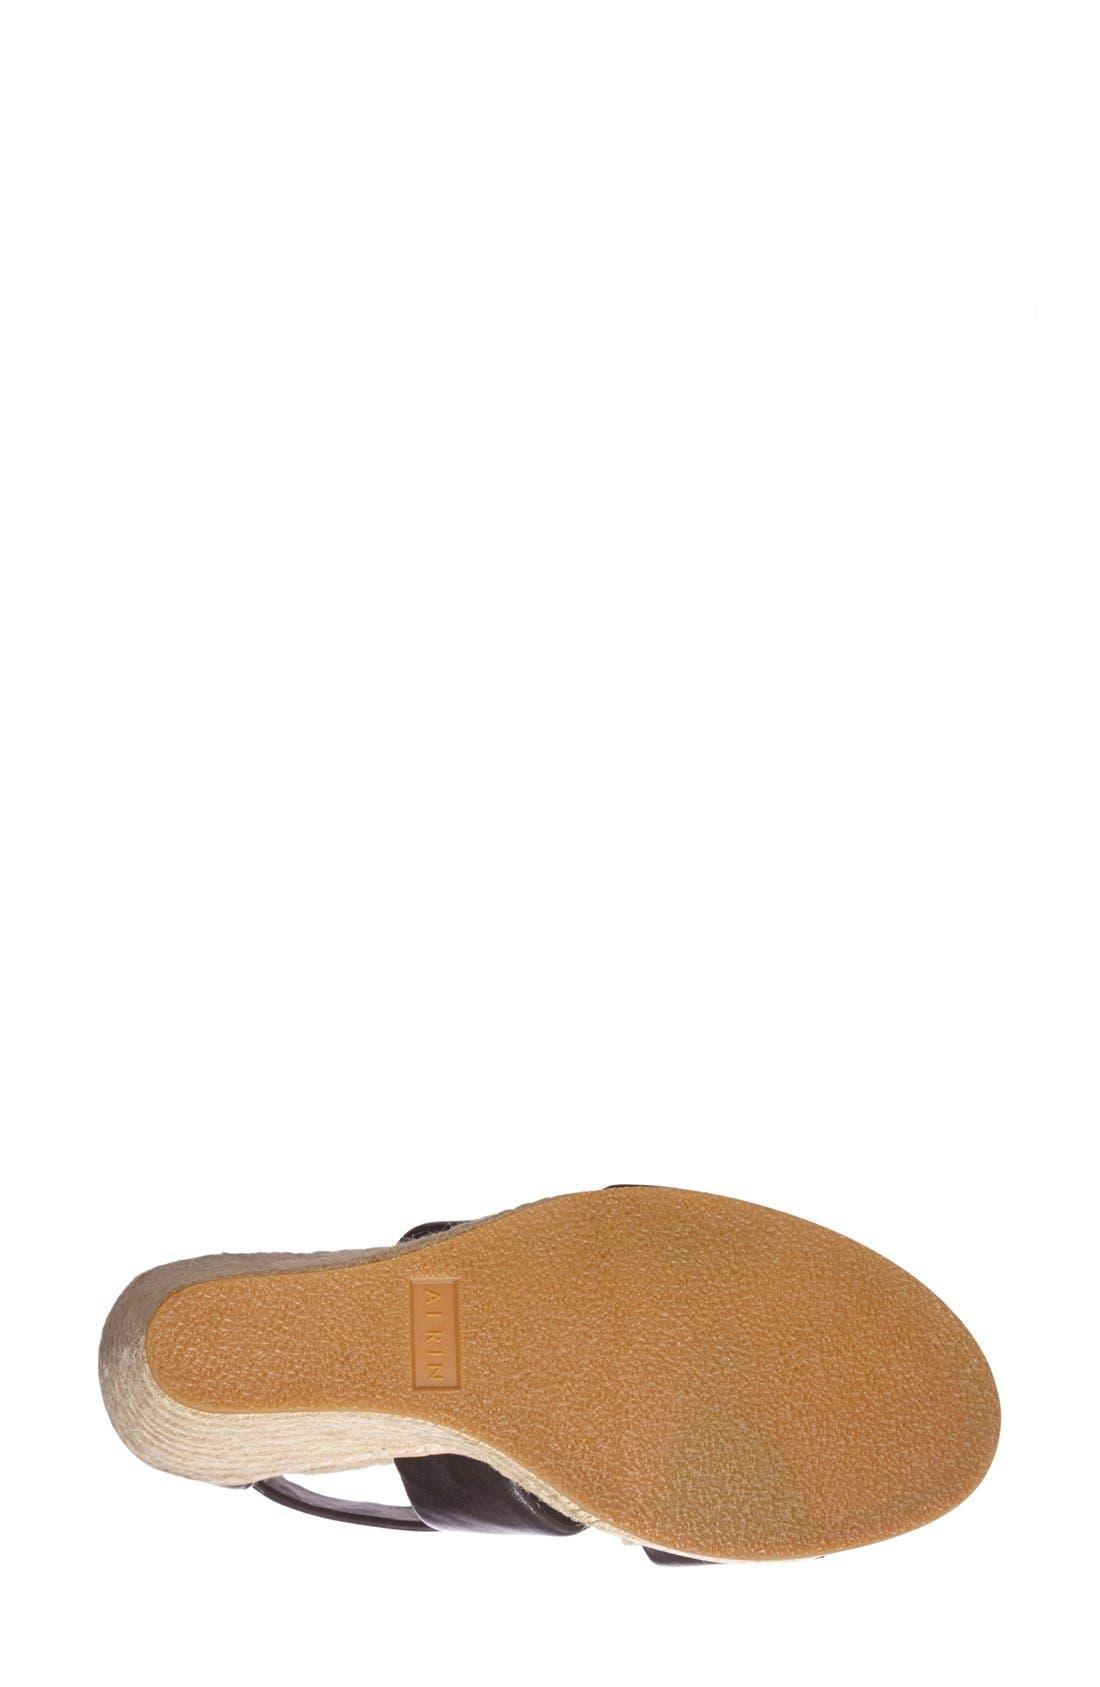 Alternate Image 4  - Aerin 'Jayden' Espadrille Wedge Sandal (Women)